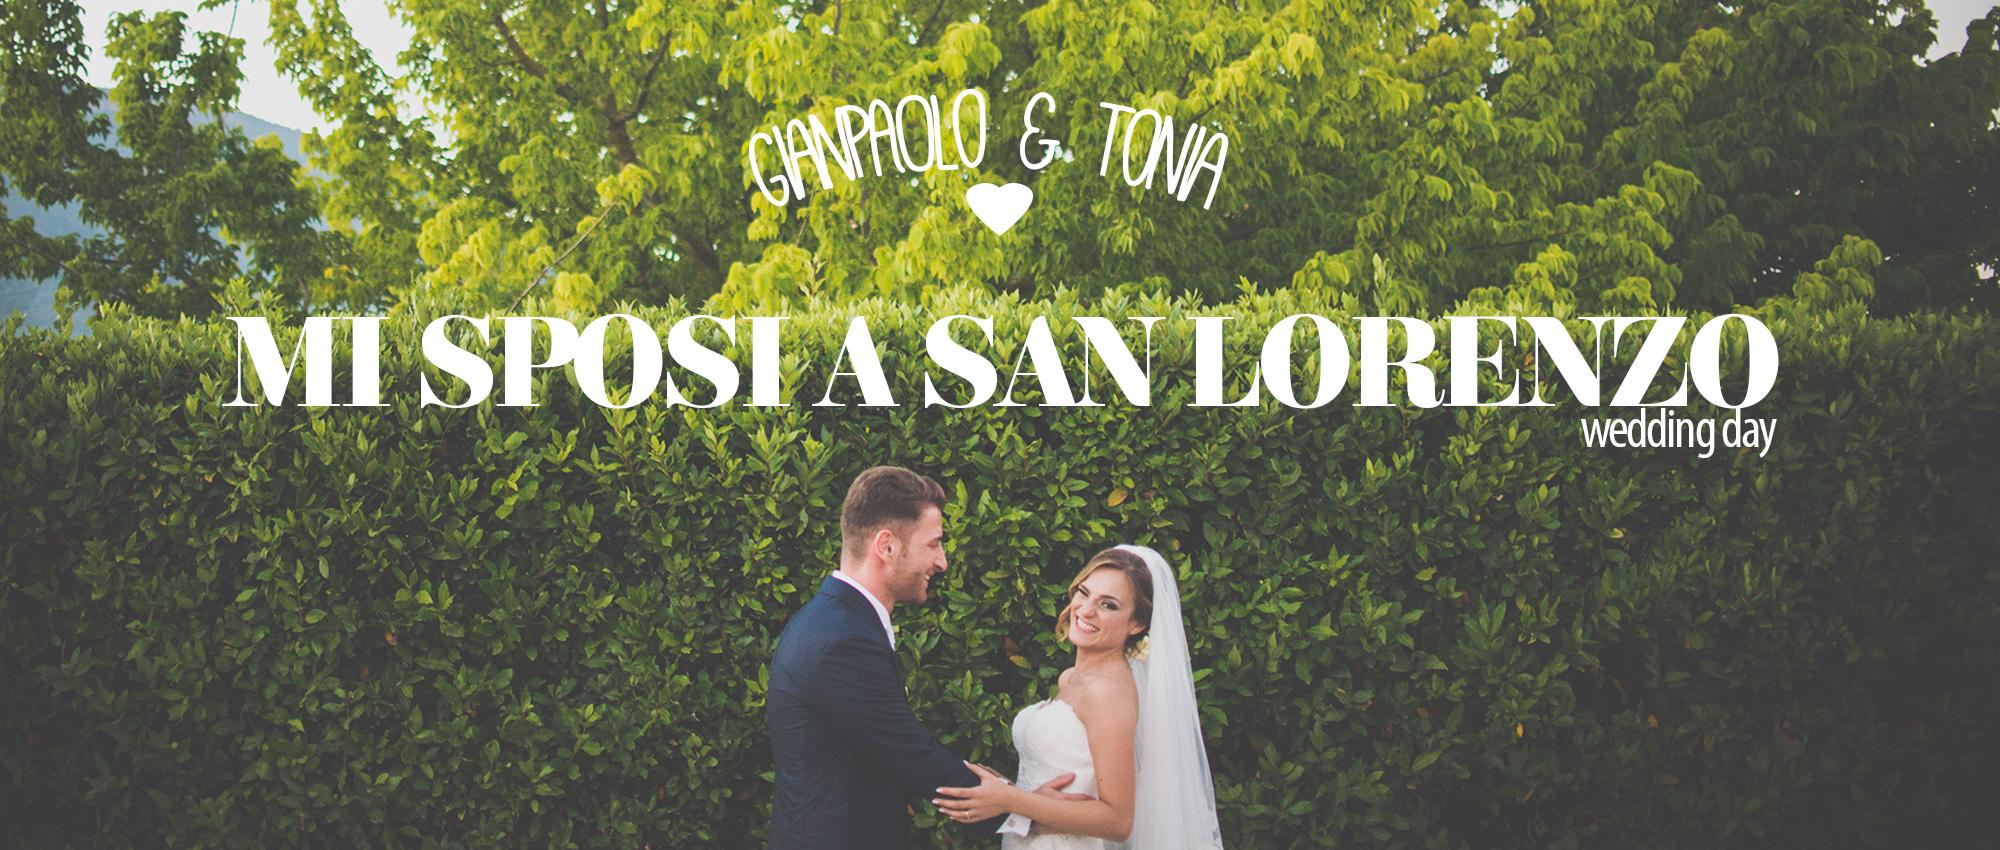 Wedding Photo married